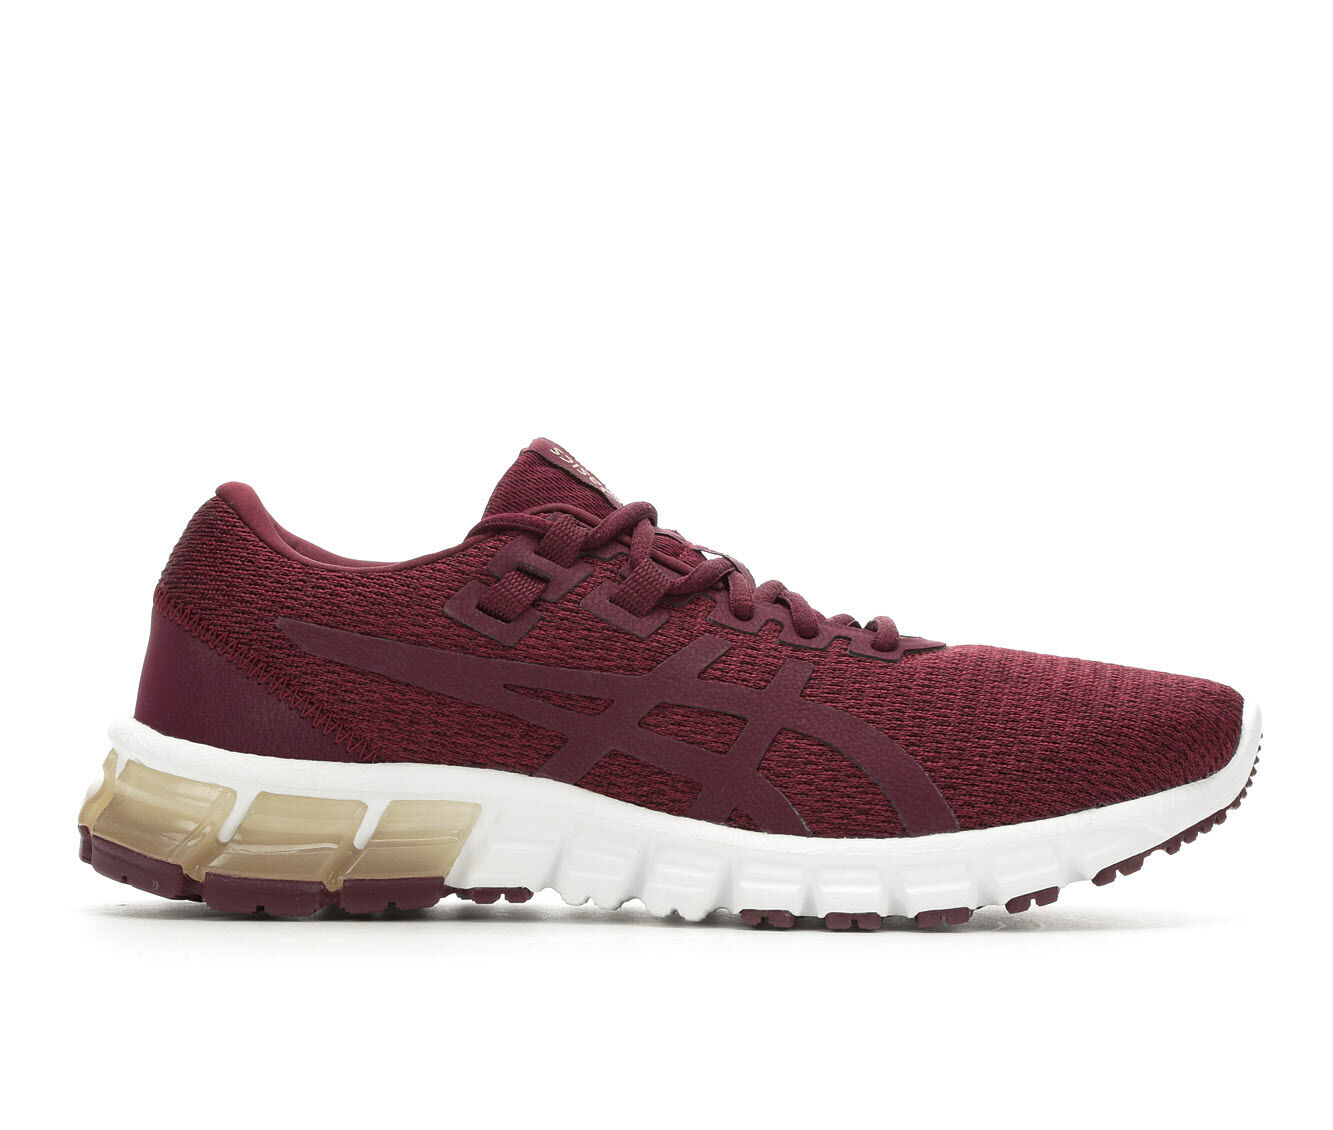 Women's ASICS Gel Quantum 90 Running Shoes Burgundy/Wht